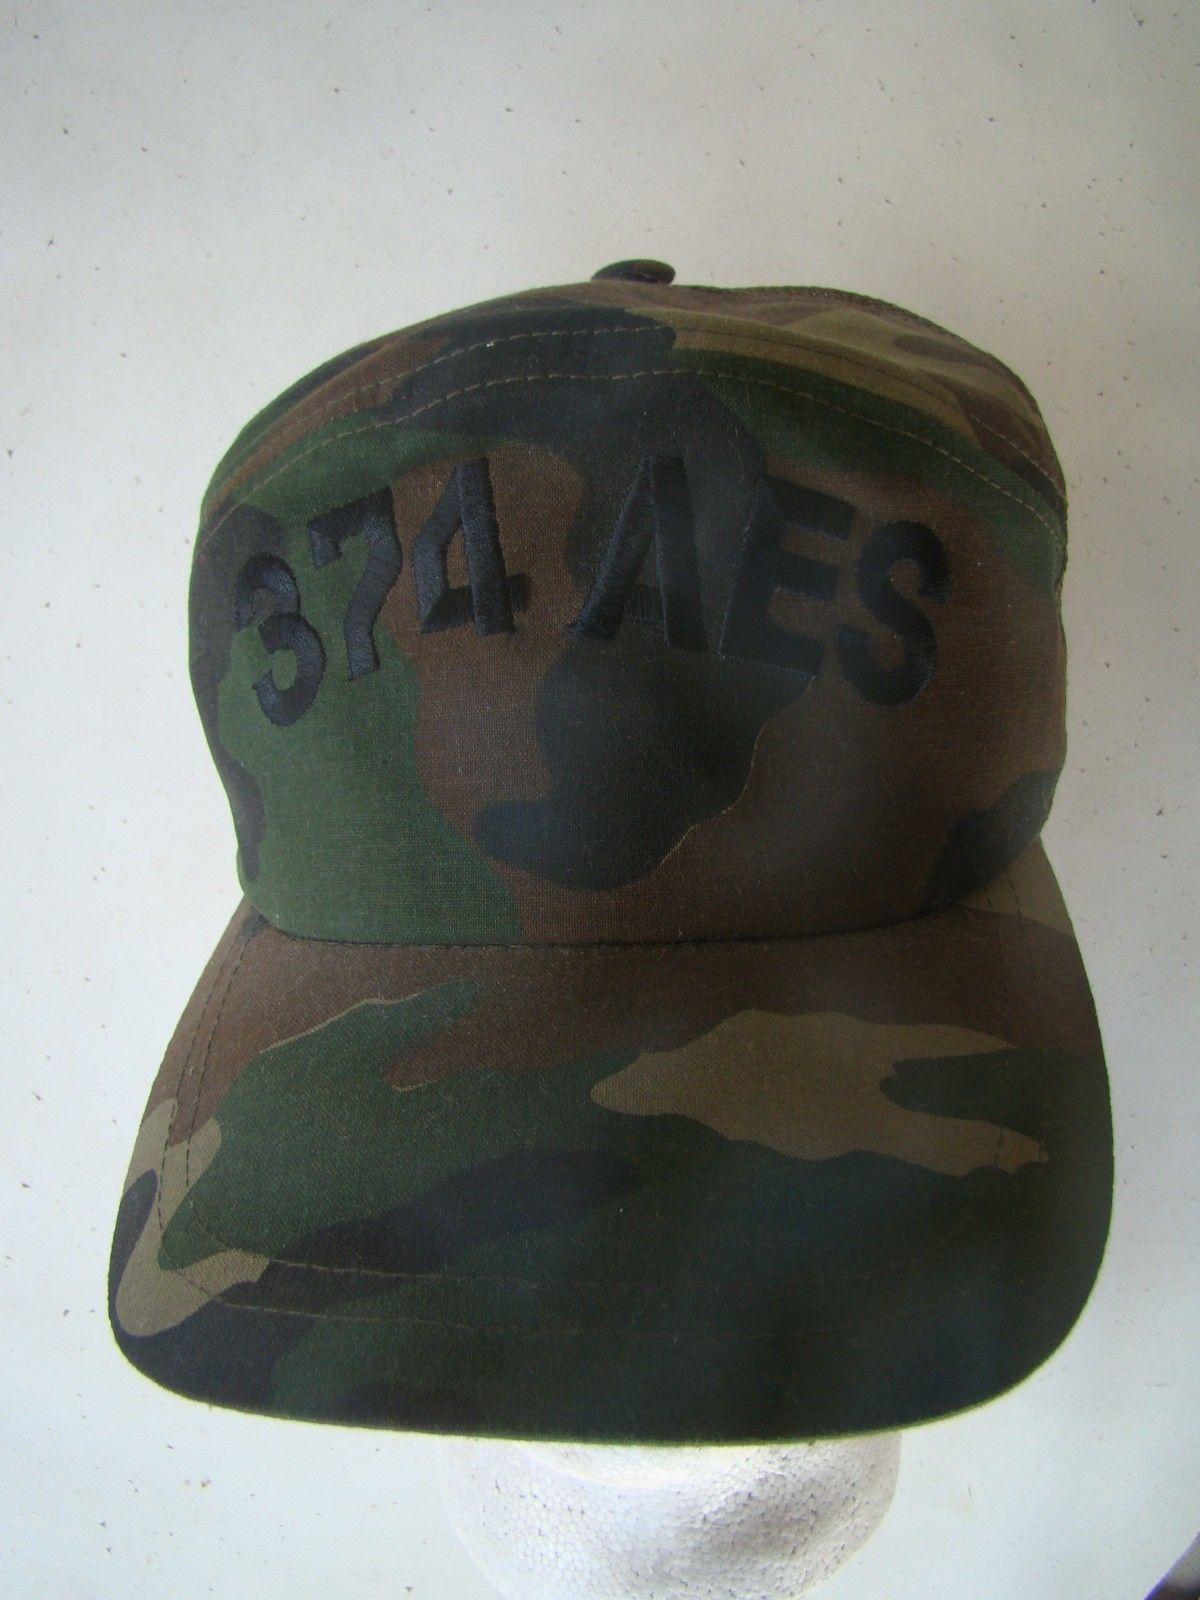 5e250d8c840 S l1600. S l1600. Previous. USAF AIR FORCE PILOT AIR GROUND CREWS WOODLAND  BDU BALL CAP BALLCAP HAT 374 AES